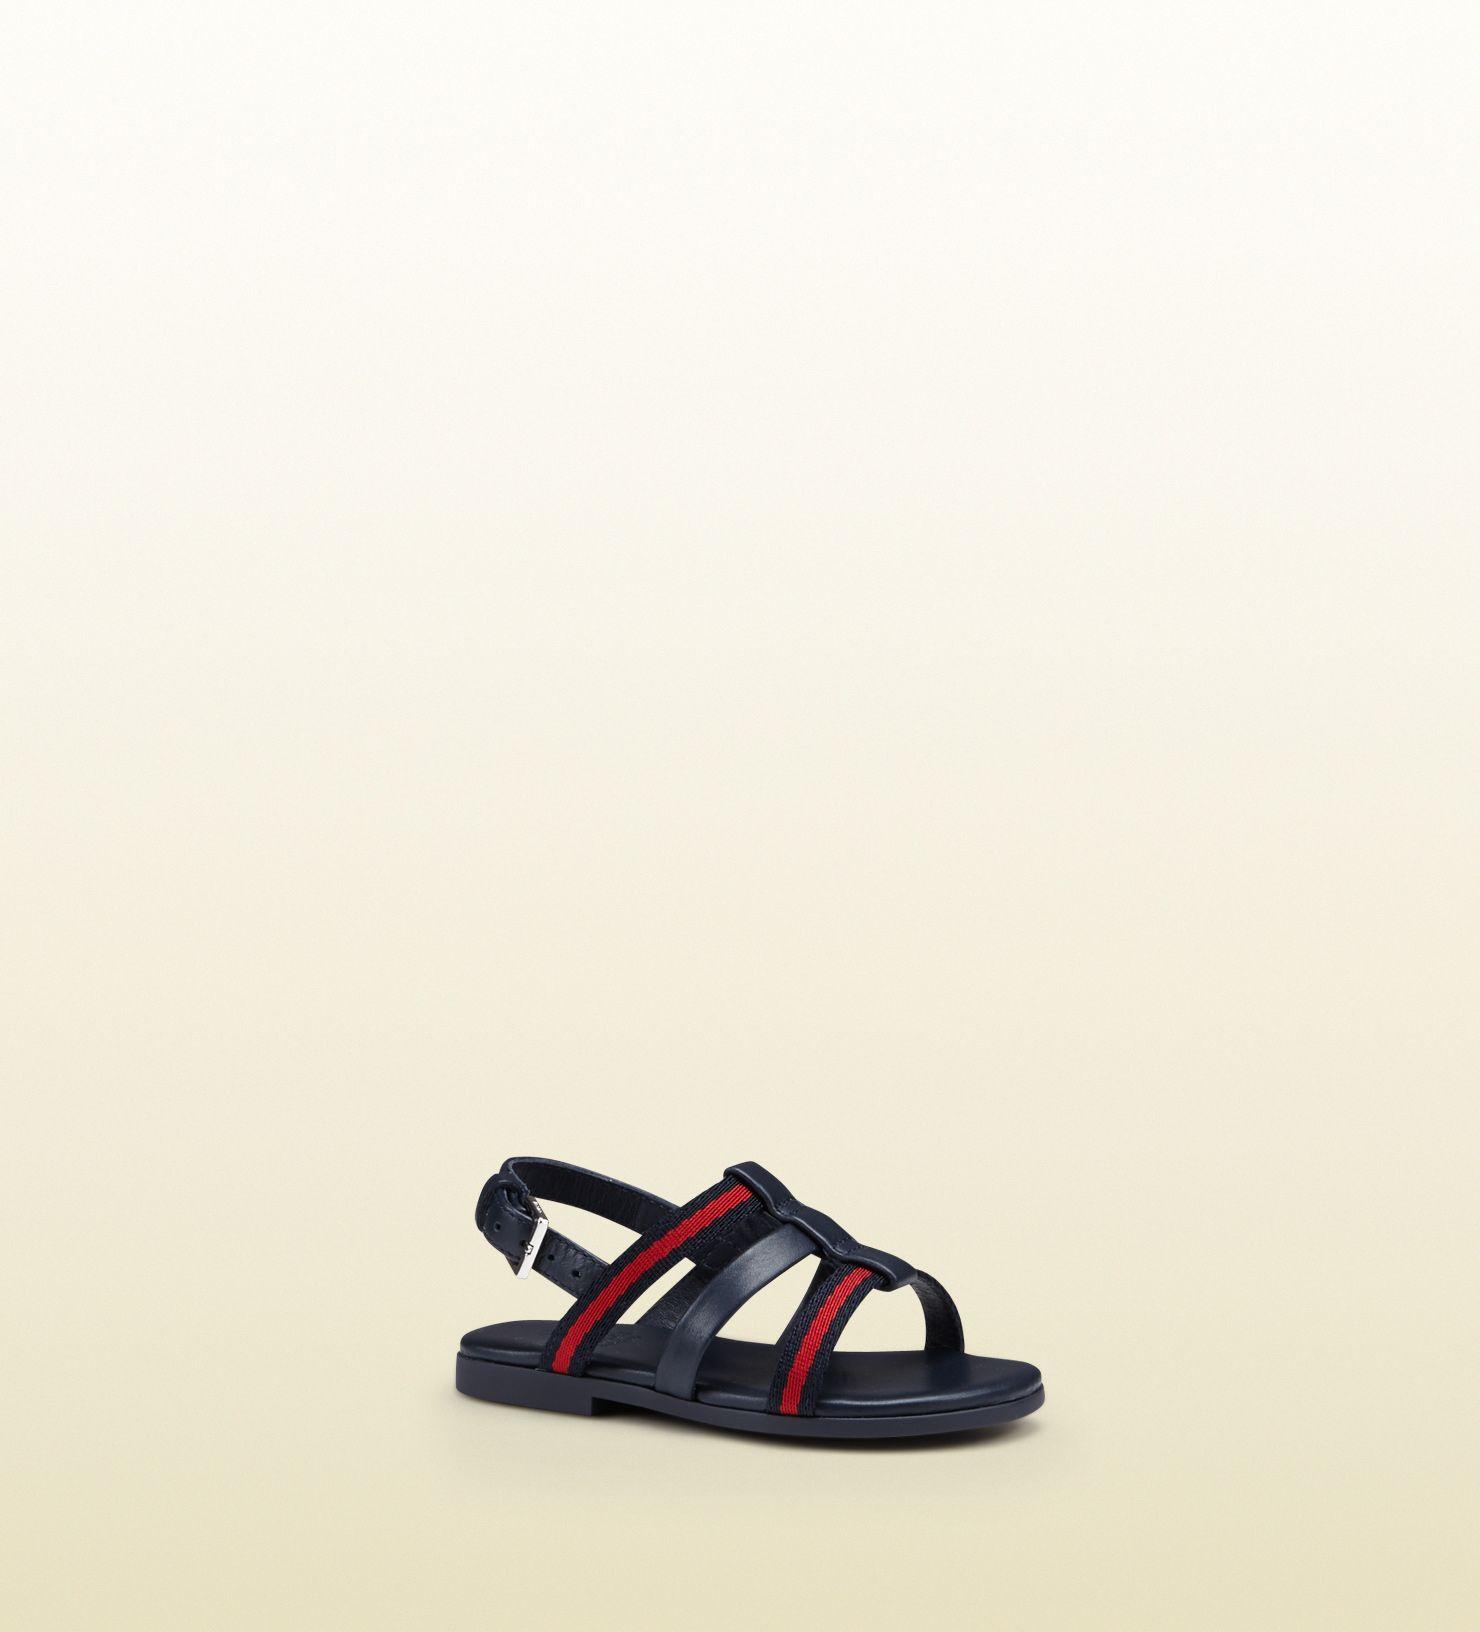 sandal with web detail #Kids